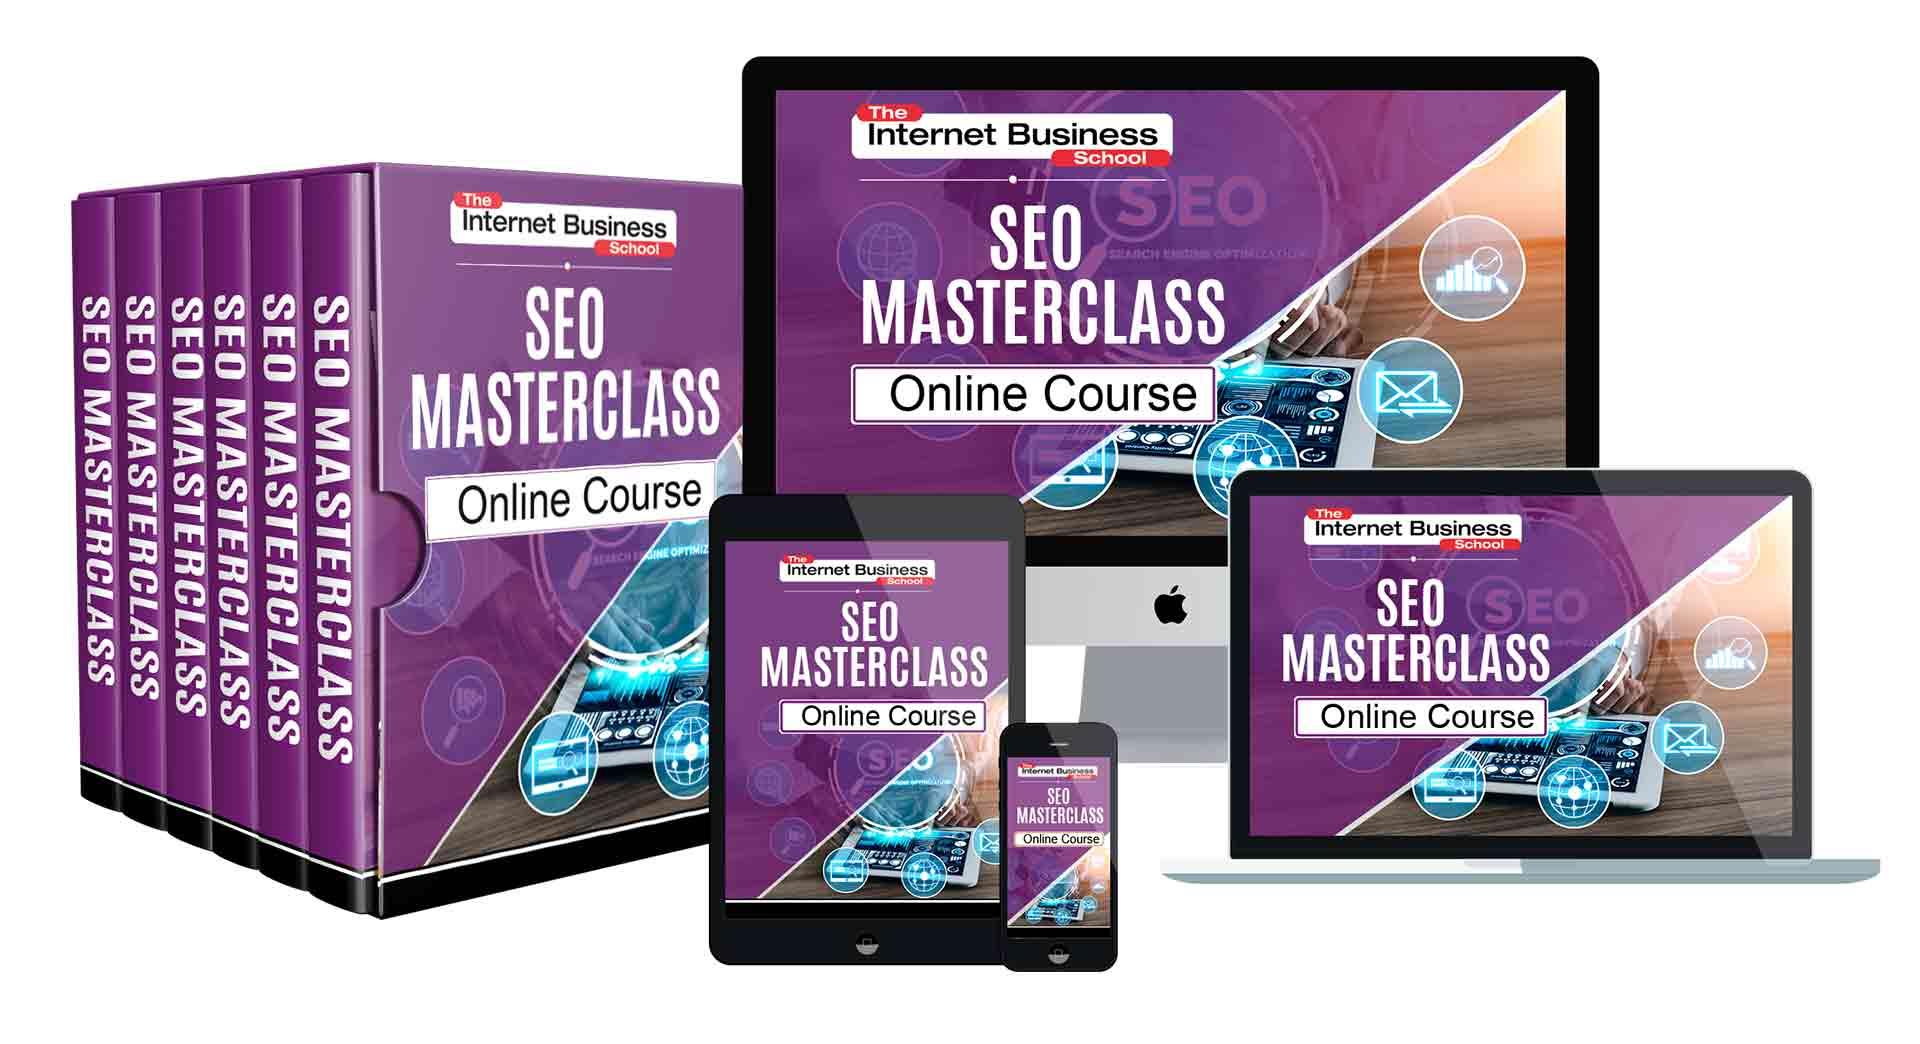 SEO Masterclass Course - Cotswold Websites